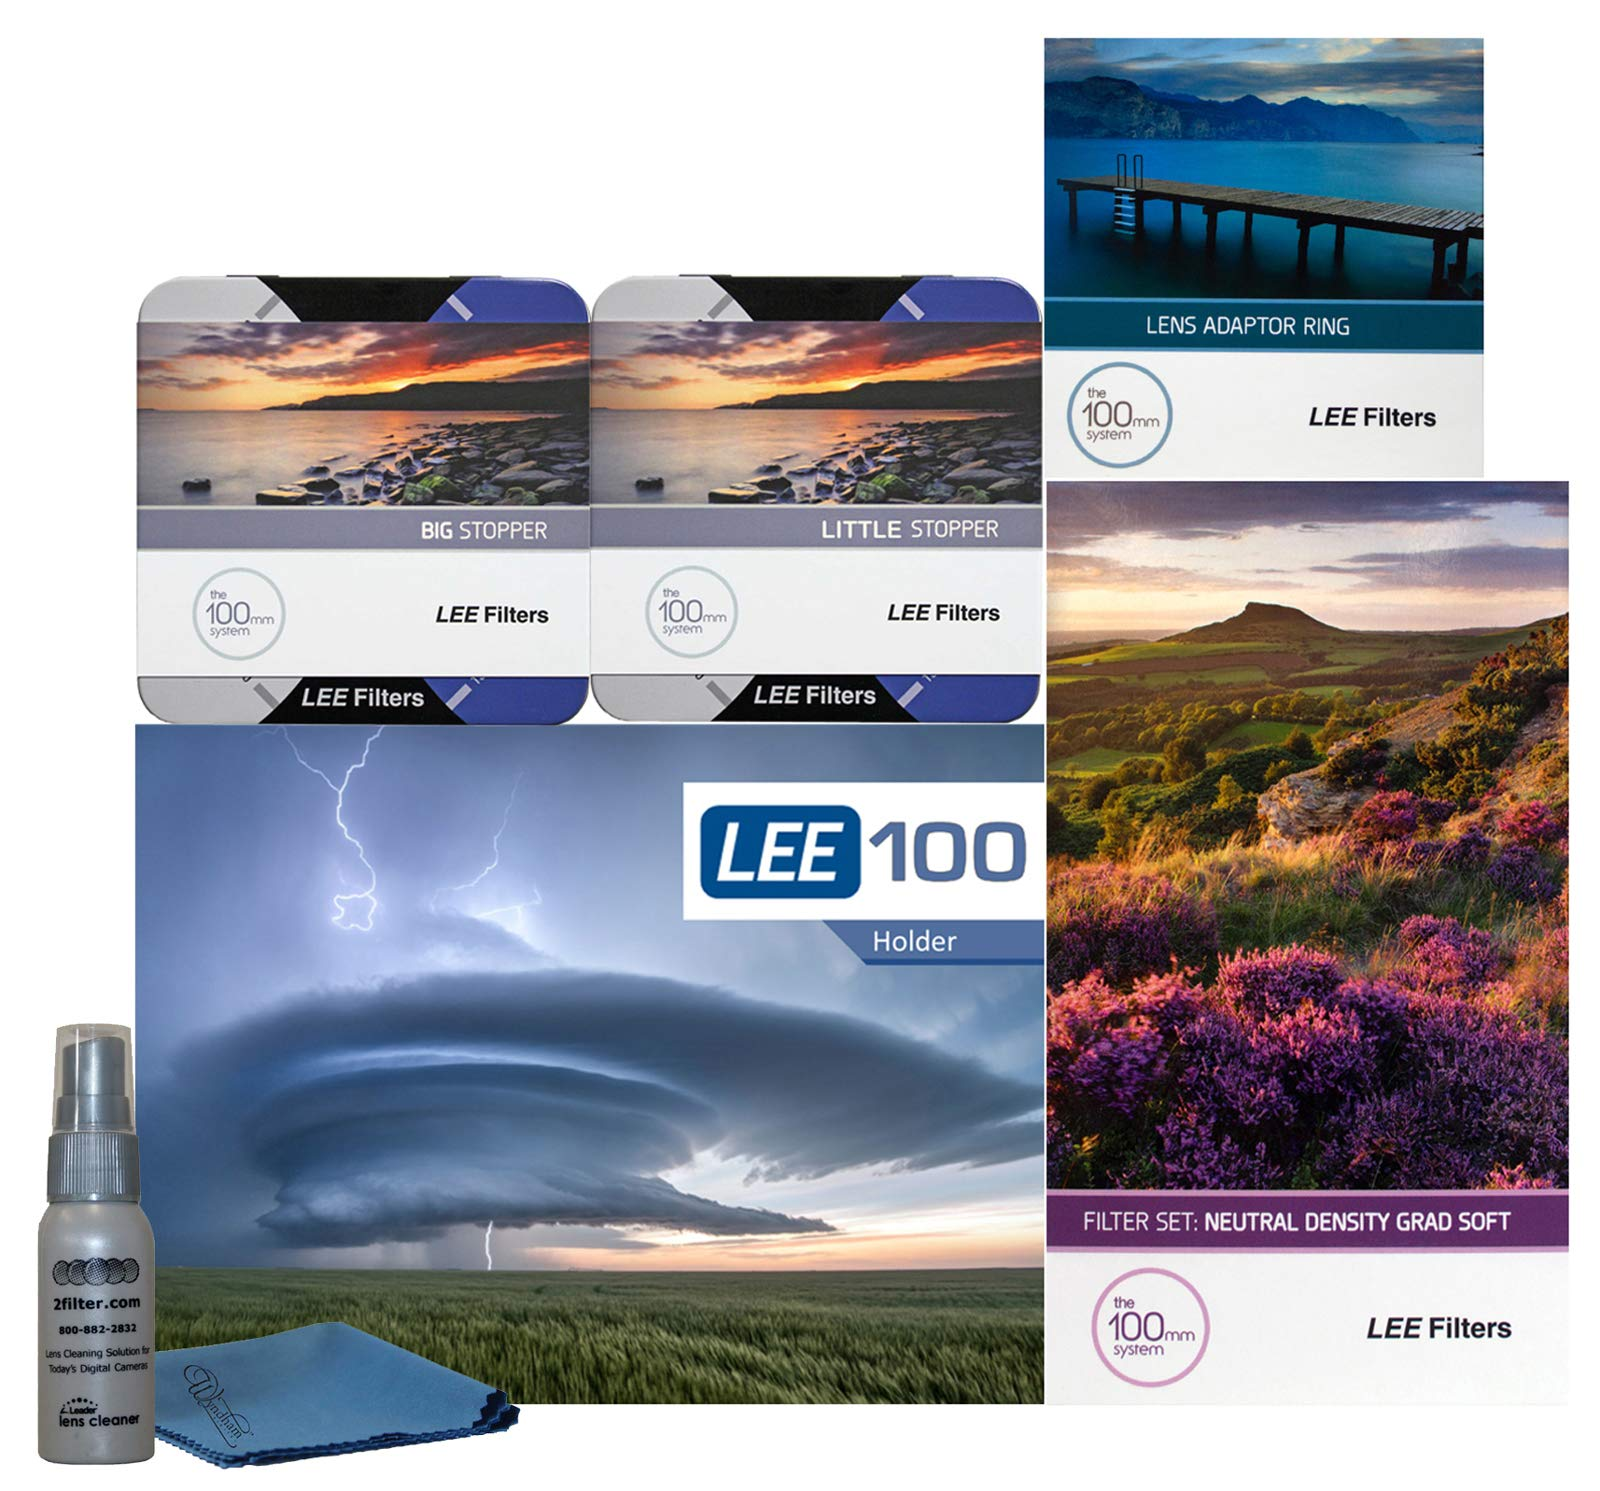 LEE Filters LEE100 82mm Landscape Pro Kit - LEE100 Filter Holder, Lee 100mm Soft Edge Set Graduated ND Filters LEE 100mm Big Stopper and Little Stopper and 82mm Wide Angle Adapter Ring by Lee Filters